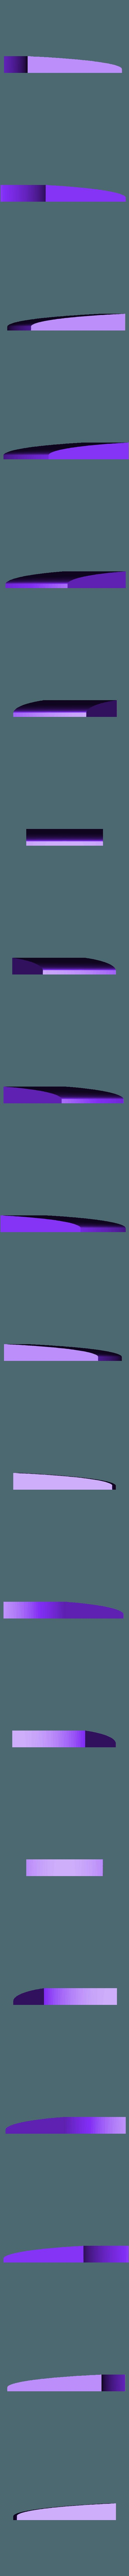 ts_band_r.stl Download free STL file Minion door spyhole cover • 3D print design, uepsie